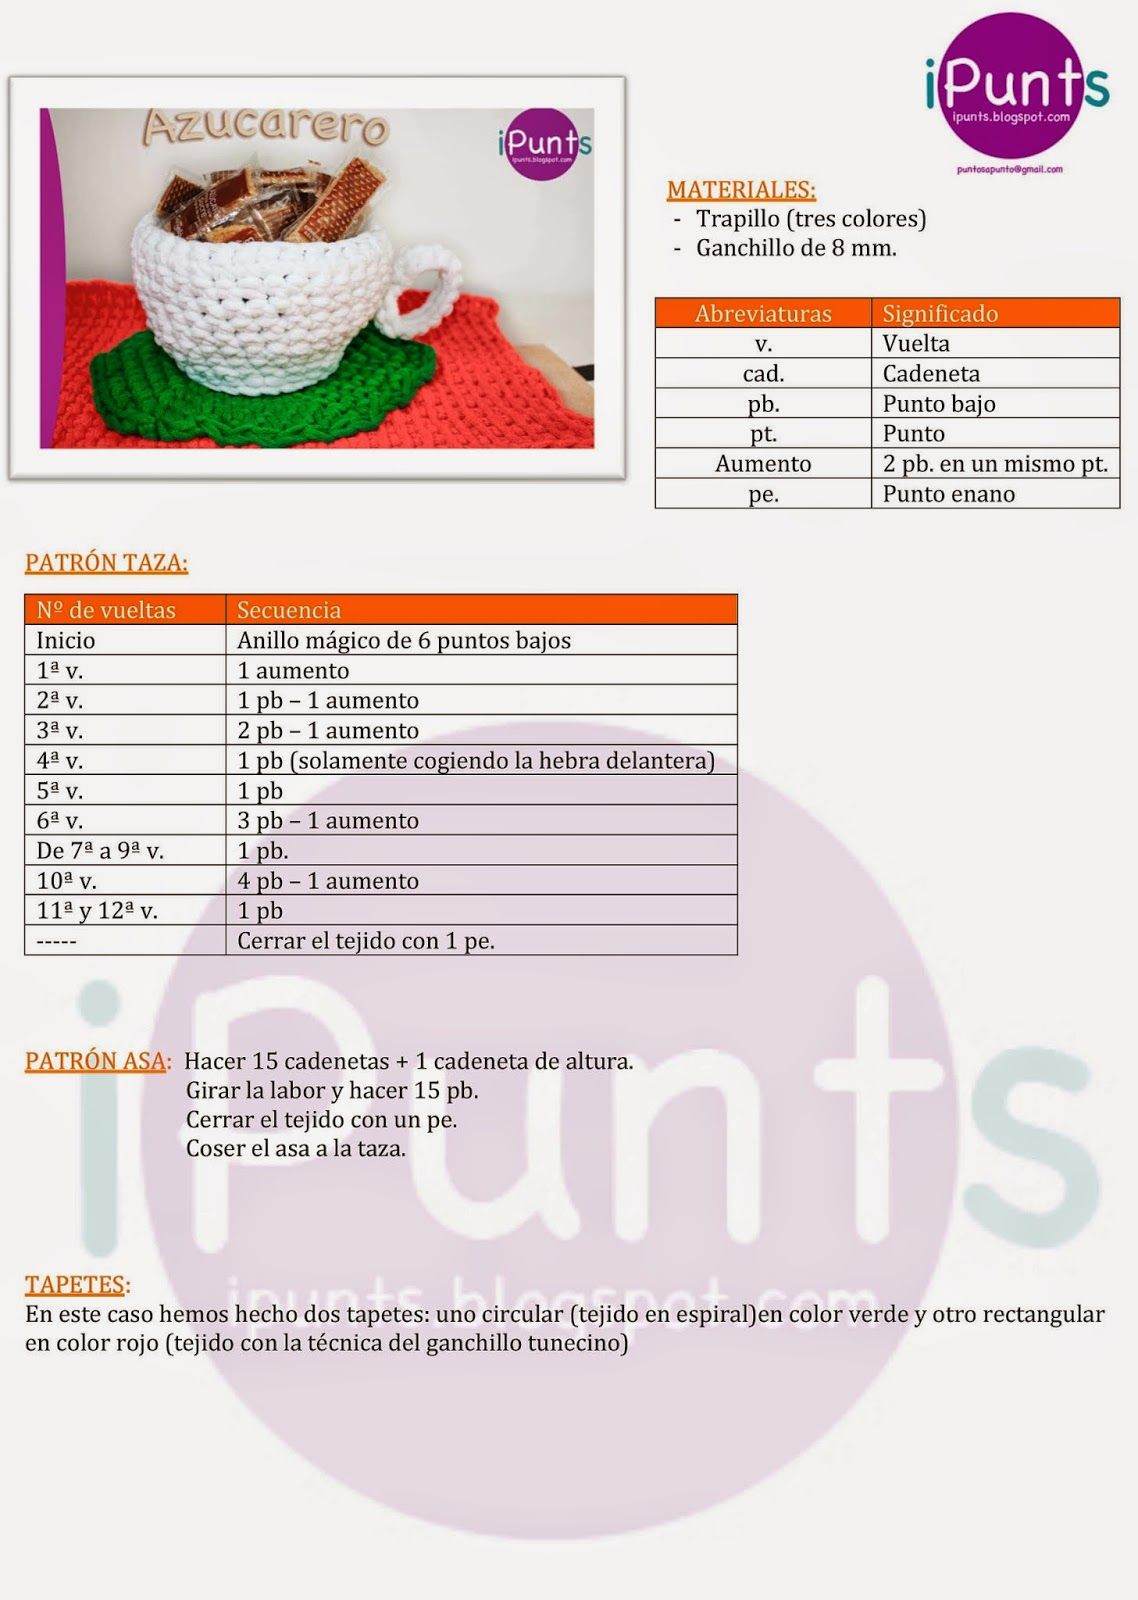 azucarero trapillo crochet ganchillo patron gratis ipunts | comida ...